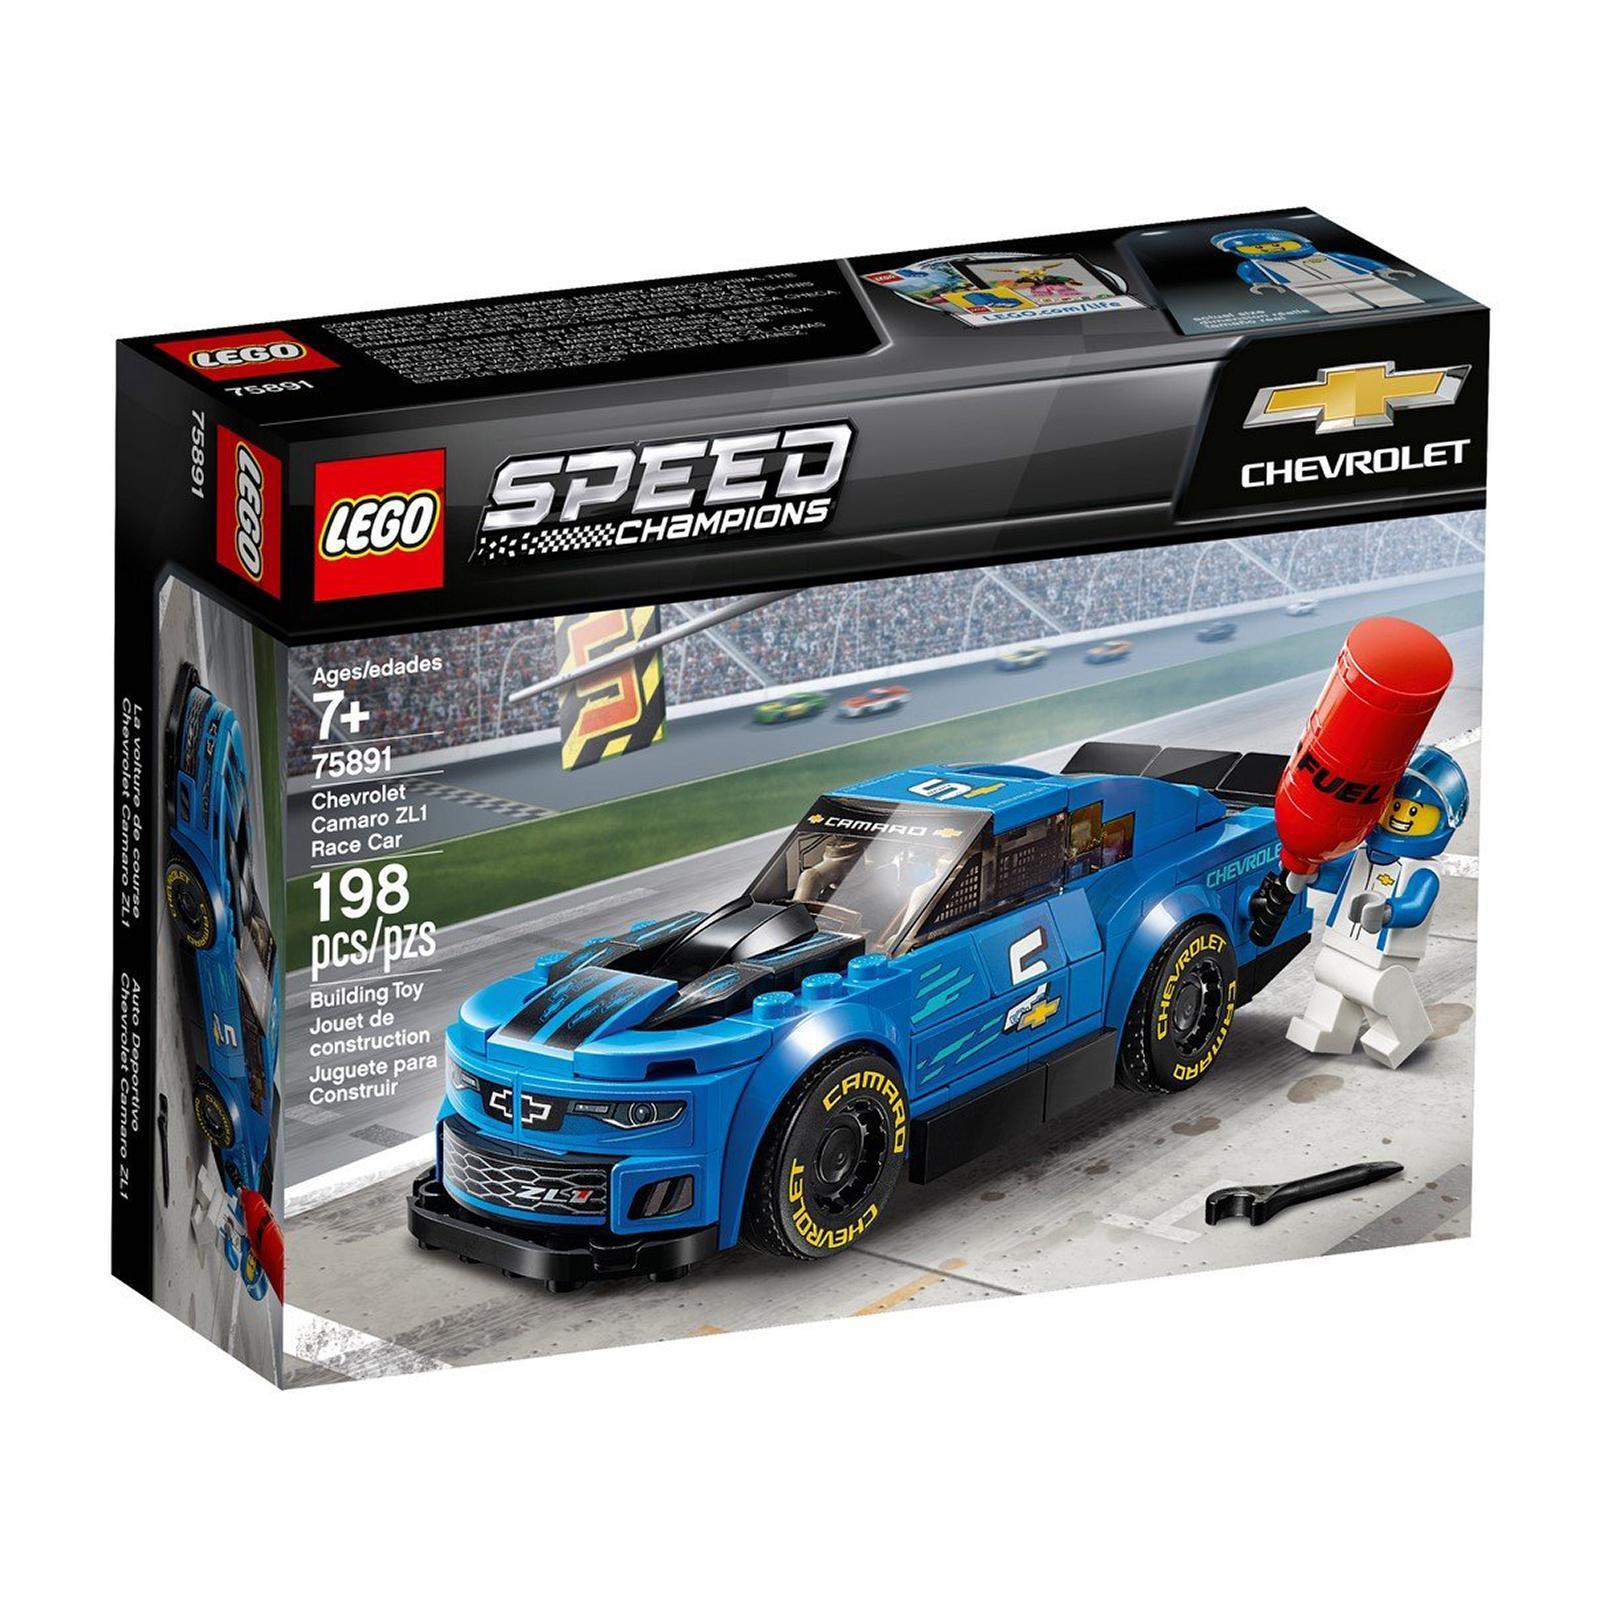 ProductsEnjoy Huge Wars star Lego Sets Latest Block Building xerdCBo